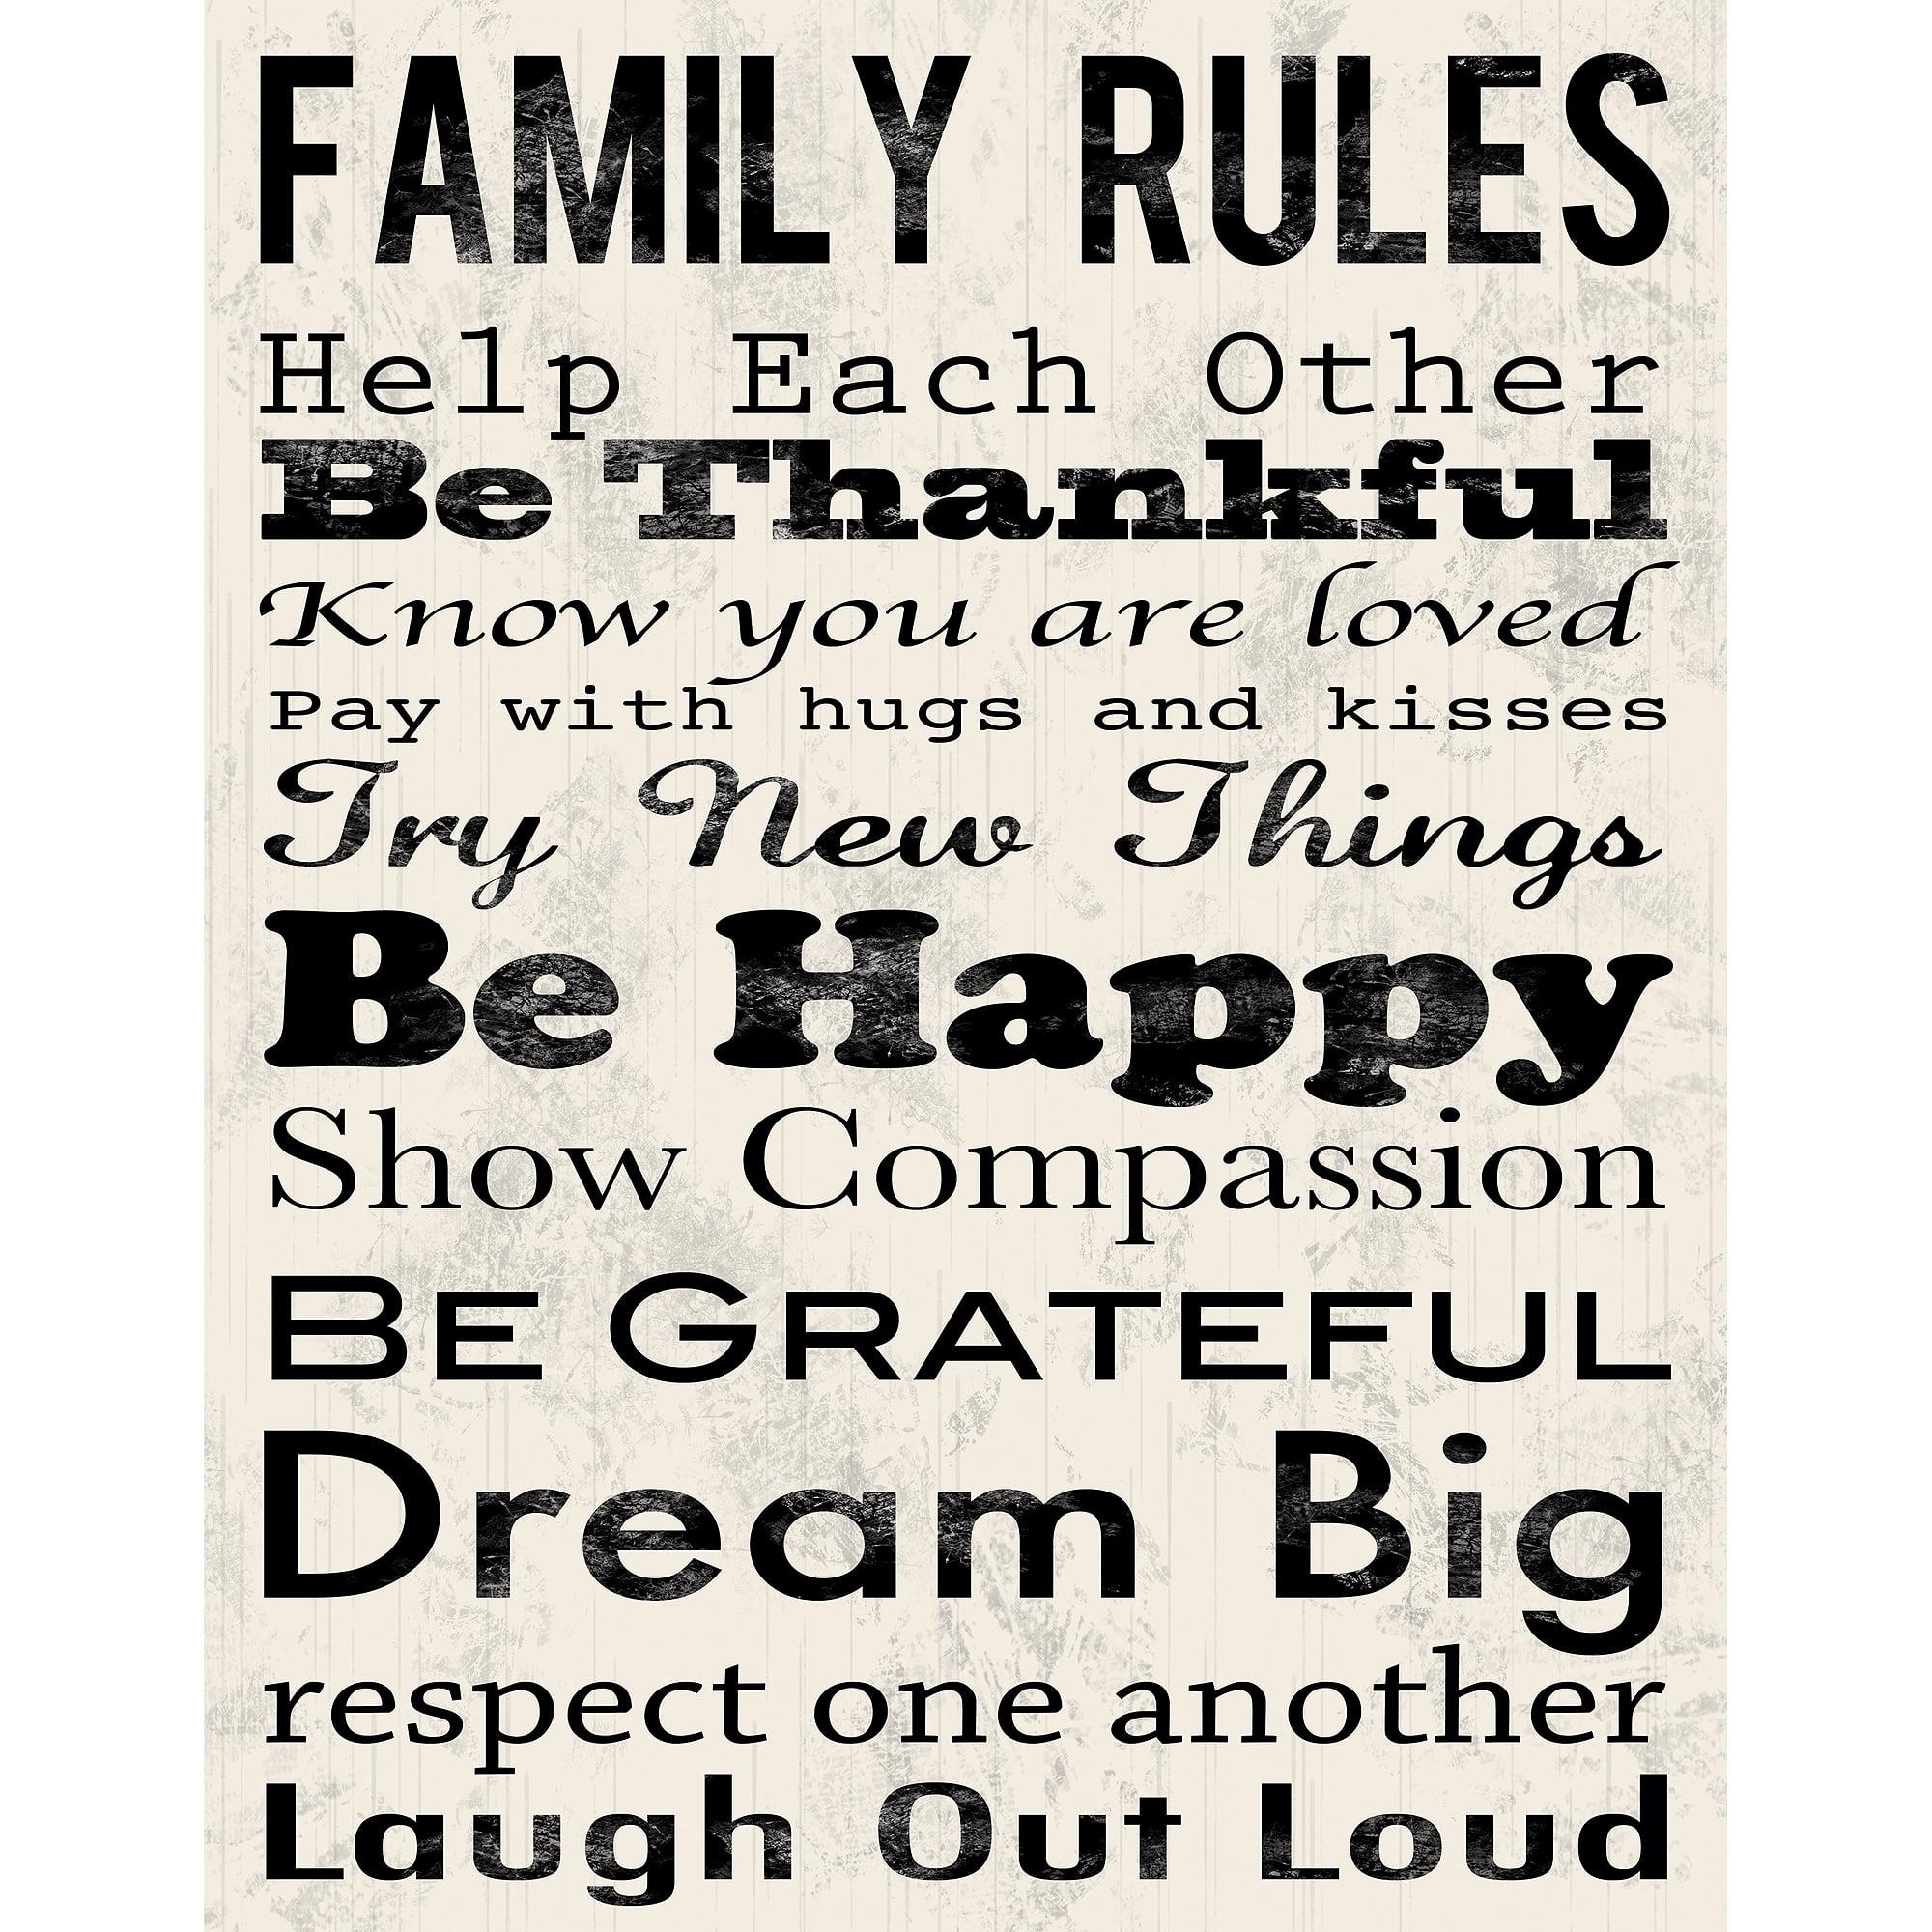 Family rules b canvas wall art 15 x 19 walmart com